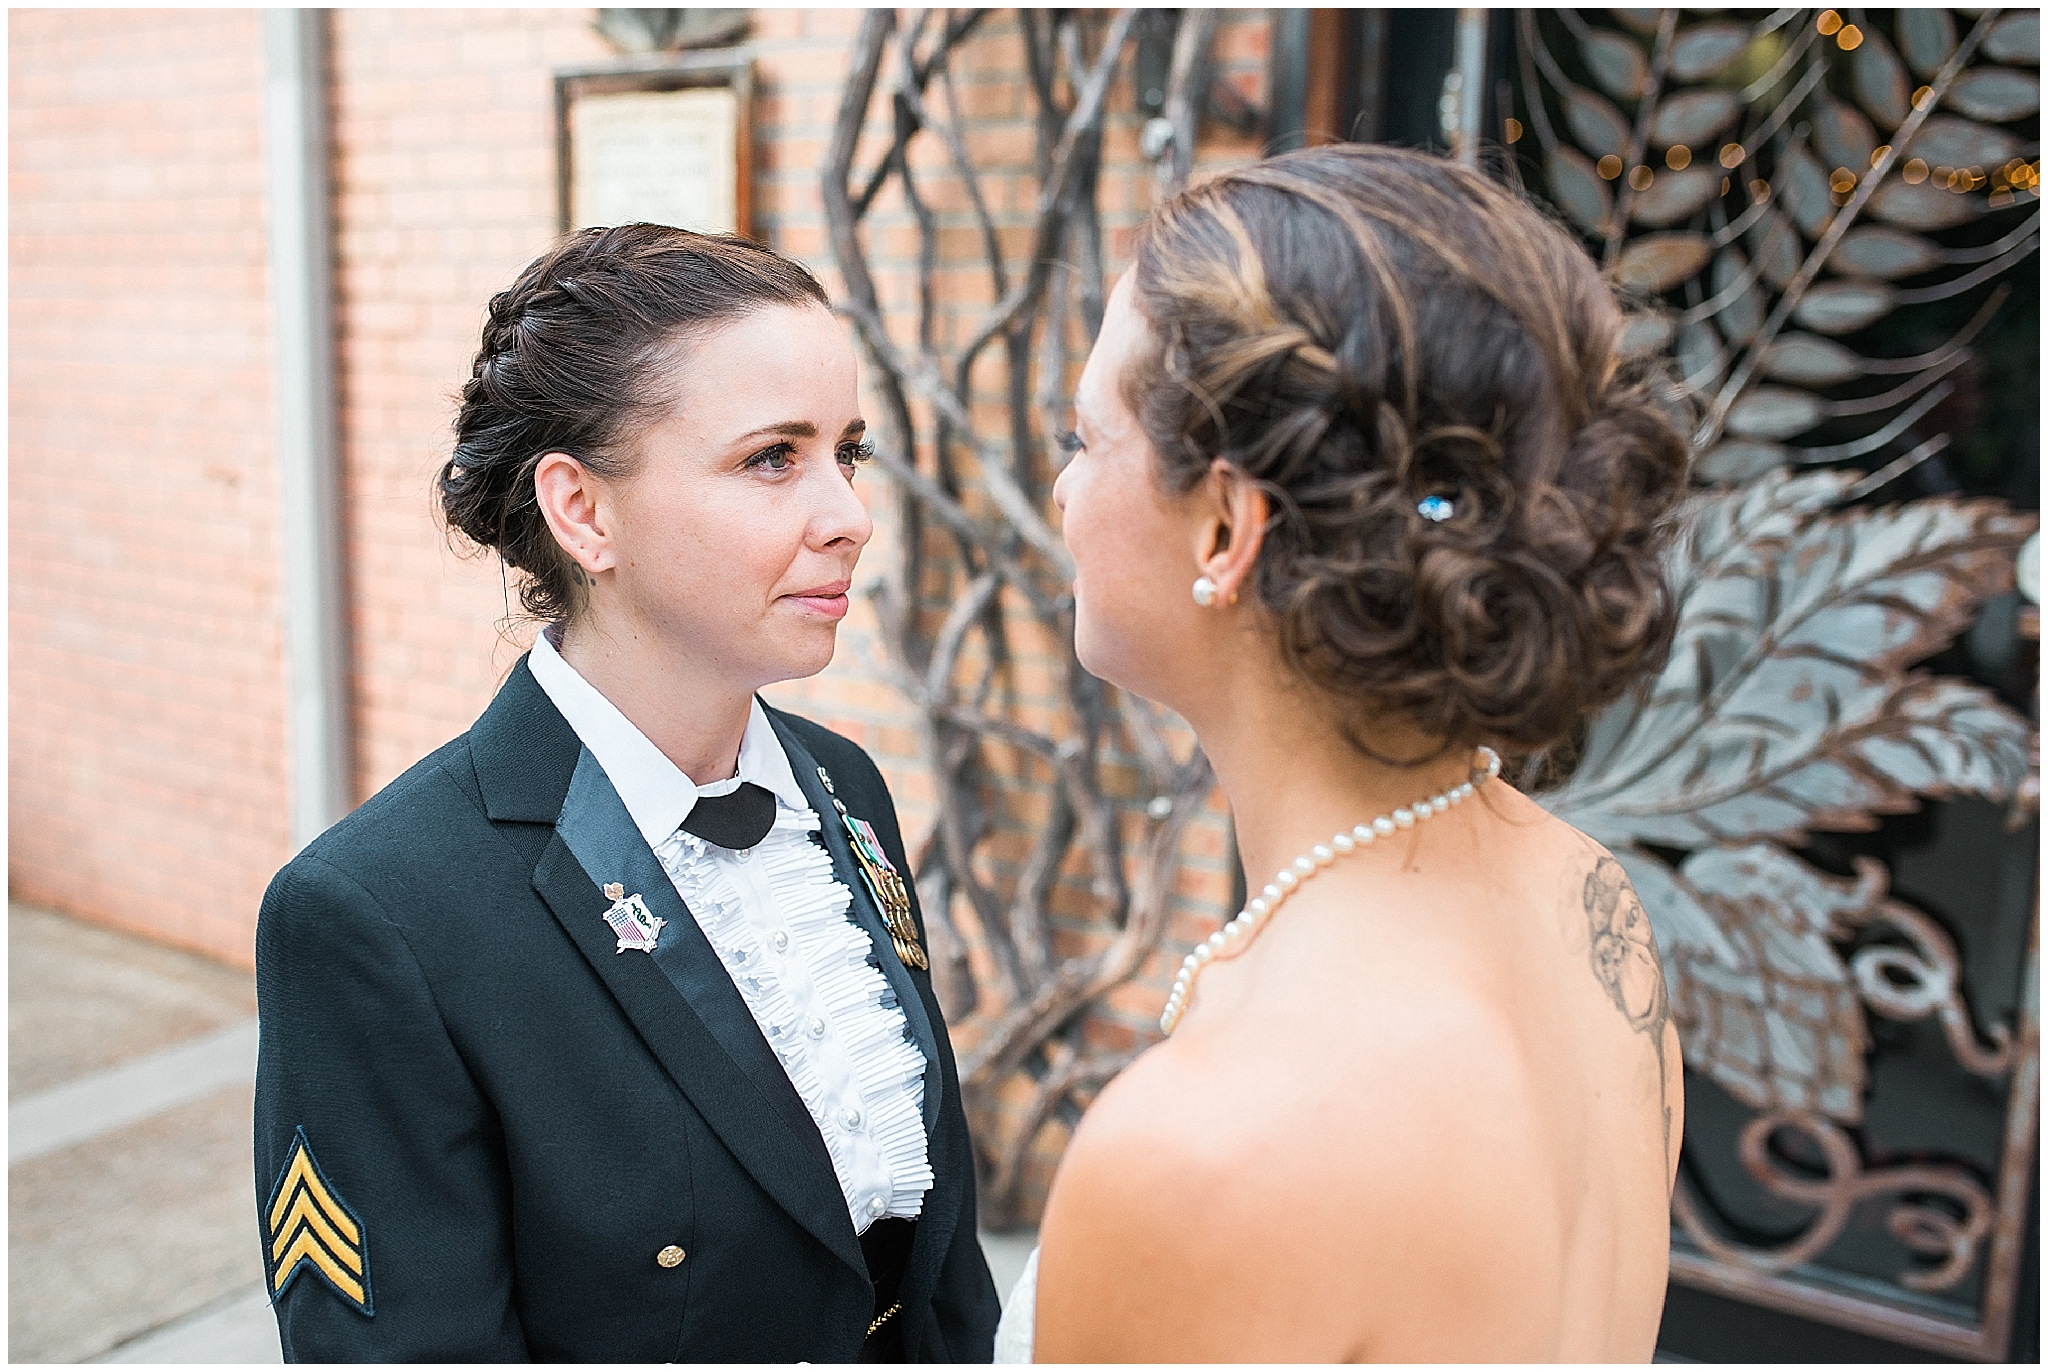 Wedding_Asheville_Highland_Brewing_Photographer_8.jpg